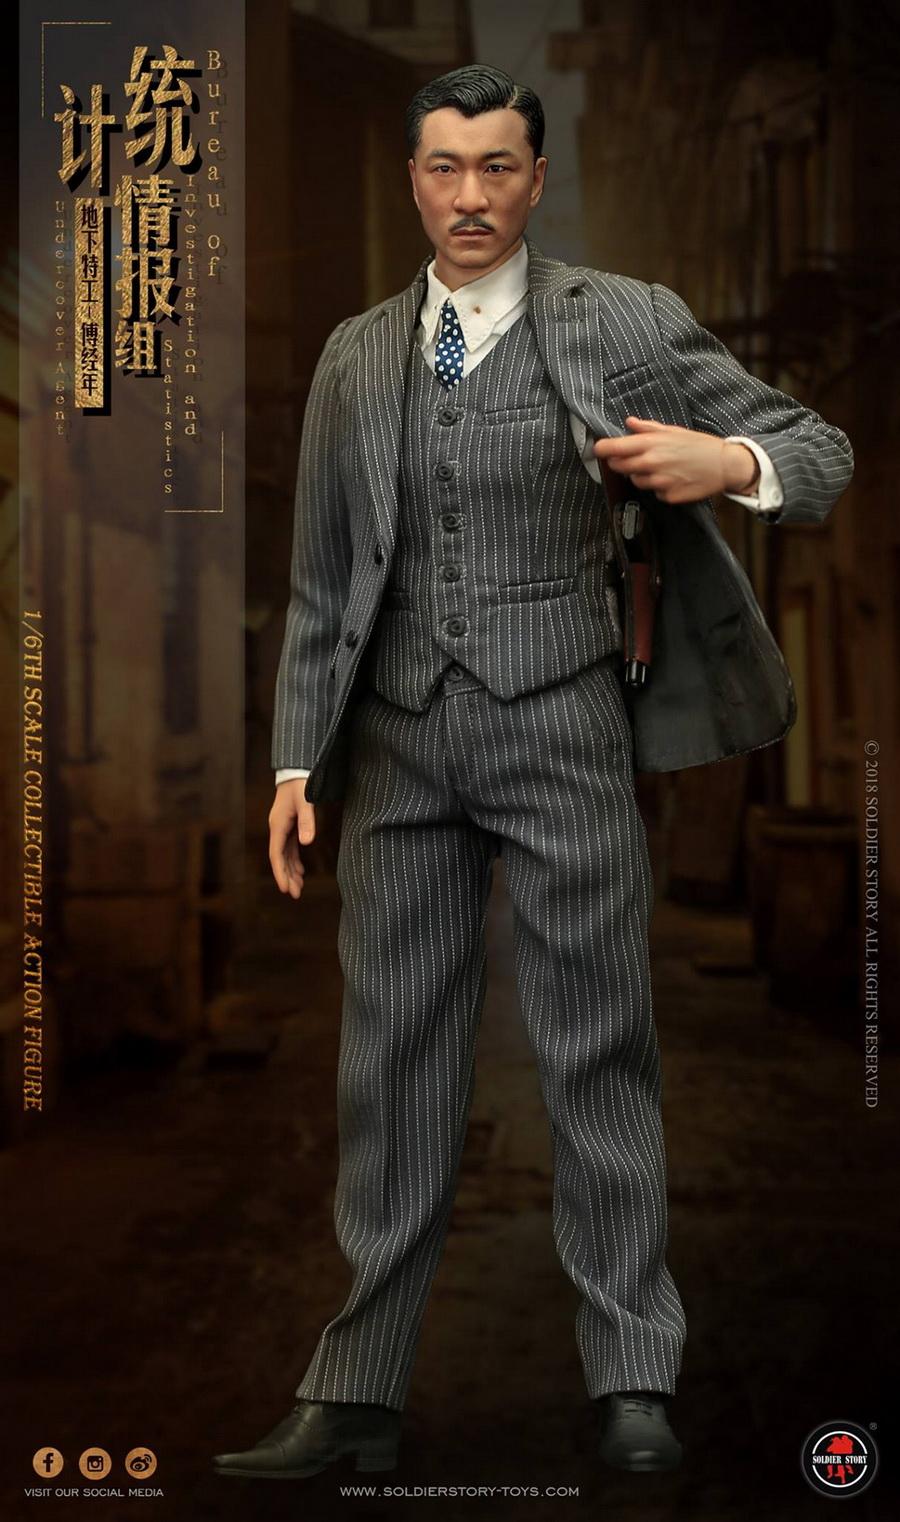 sost-Undercover Agent01